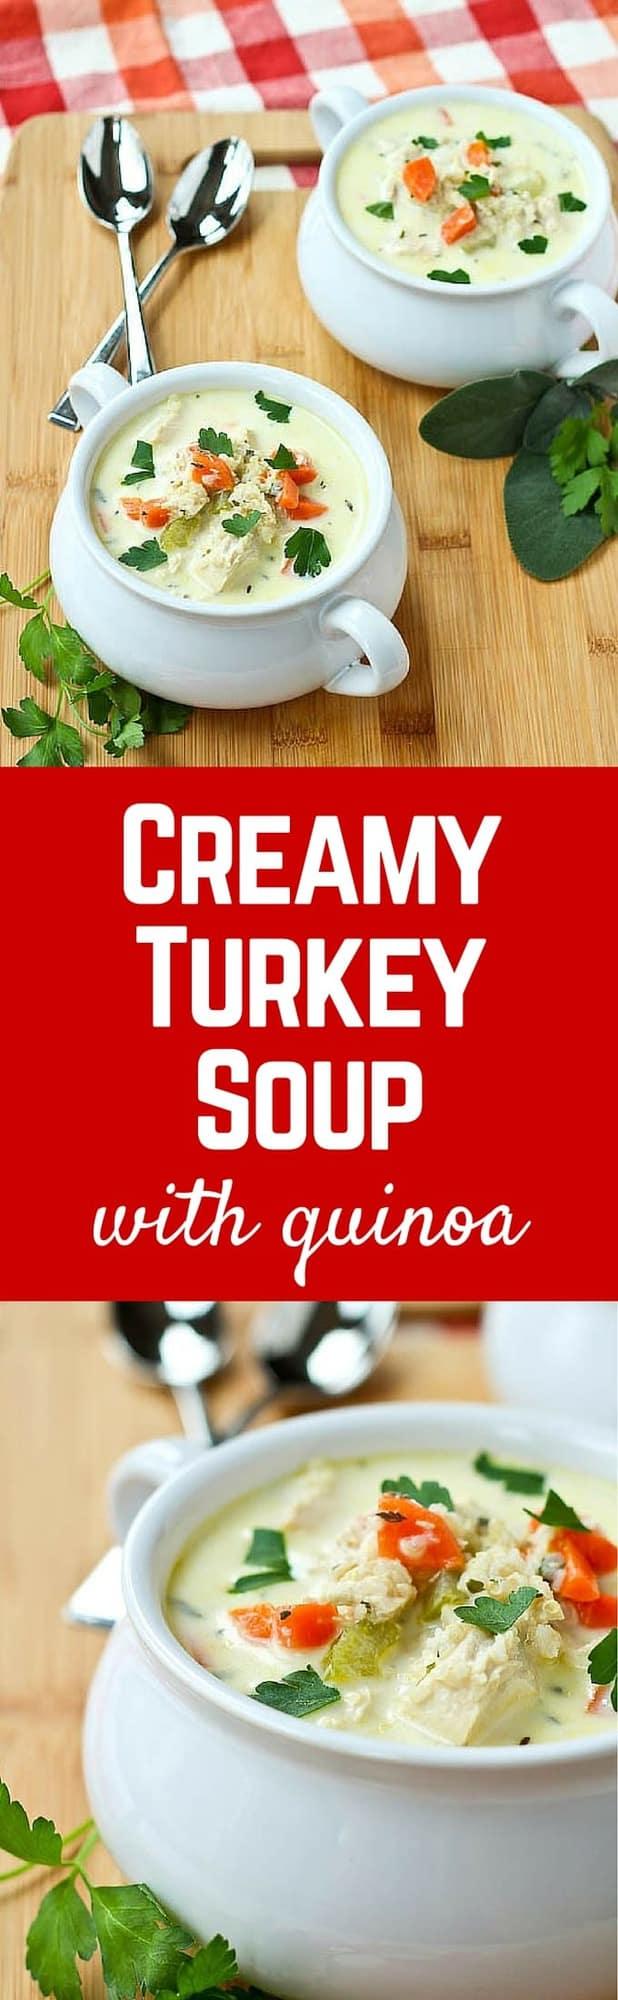 Cream turkey soup recipes easy